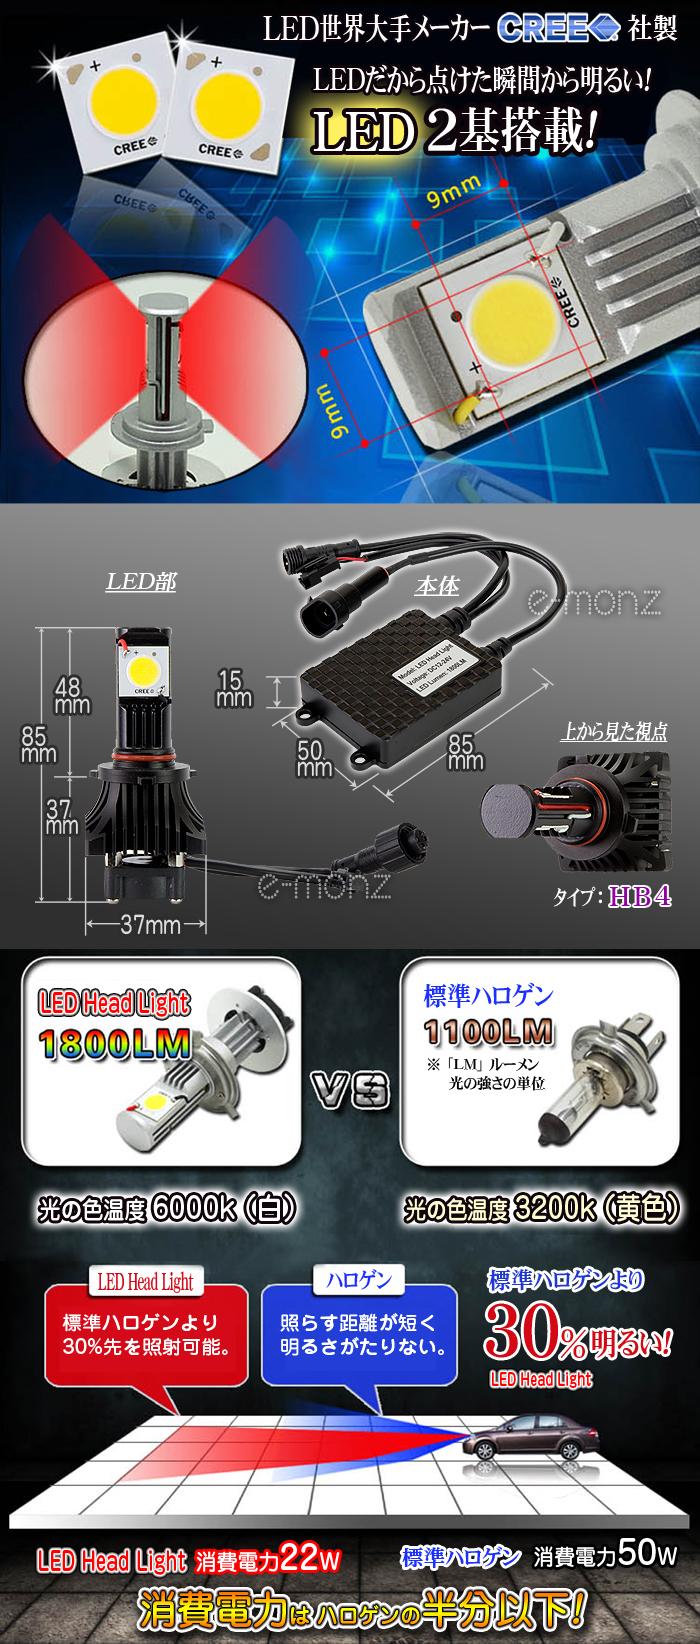 LEDヘッドライト用バルブ 9006(HB3) CREE製チップ採用で安心